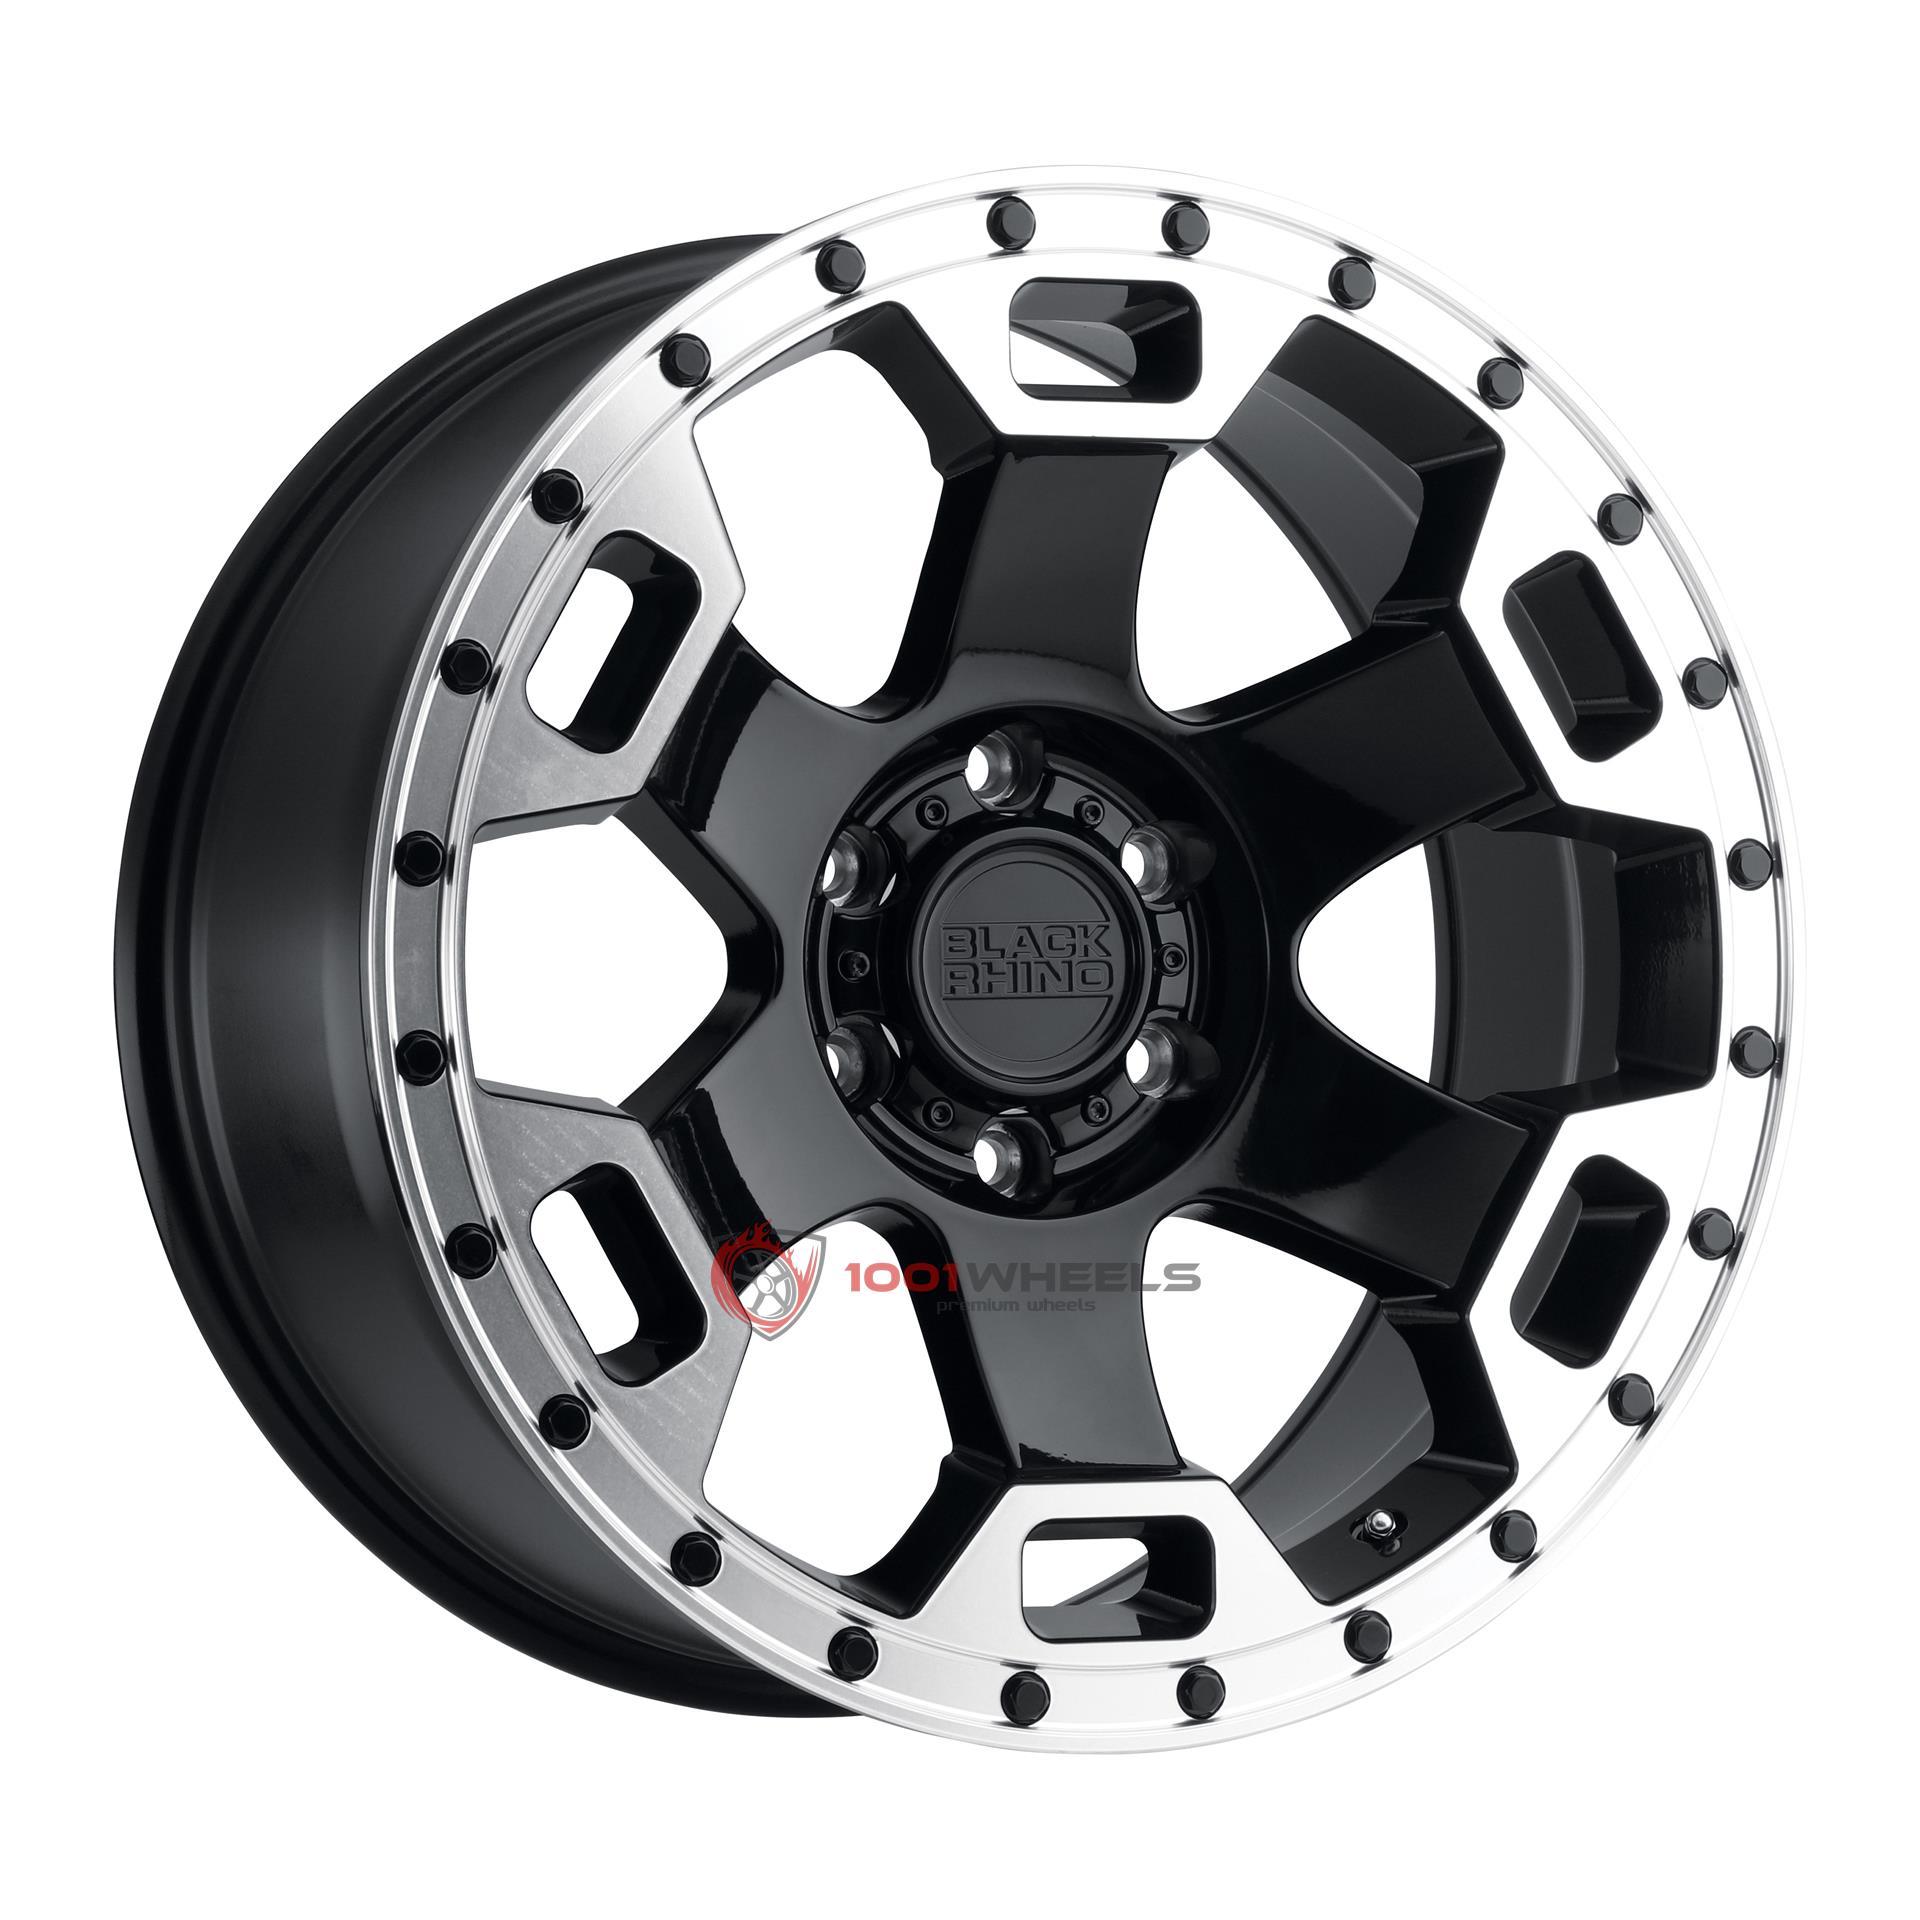 BLACK RHINO GAUNTLET gloss-black-wmirror-machined-lip-edge